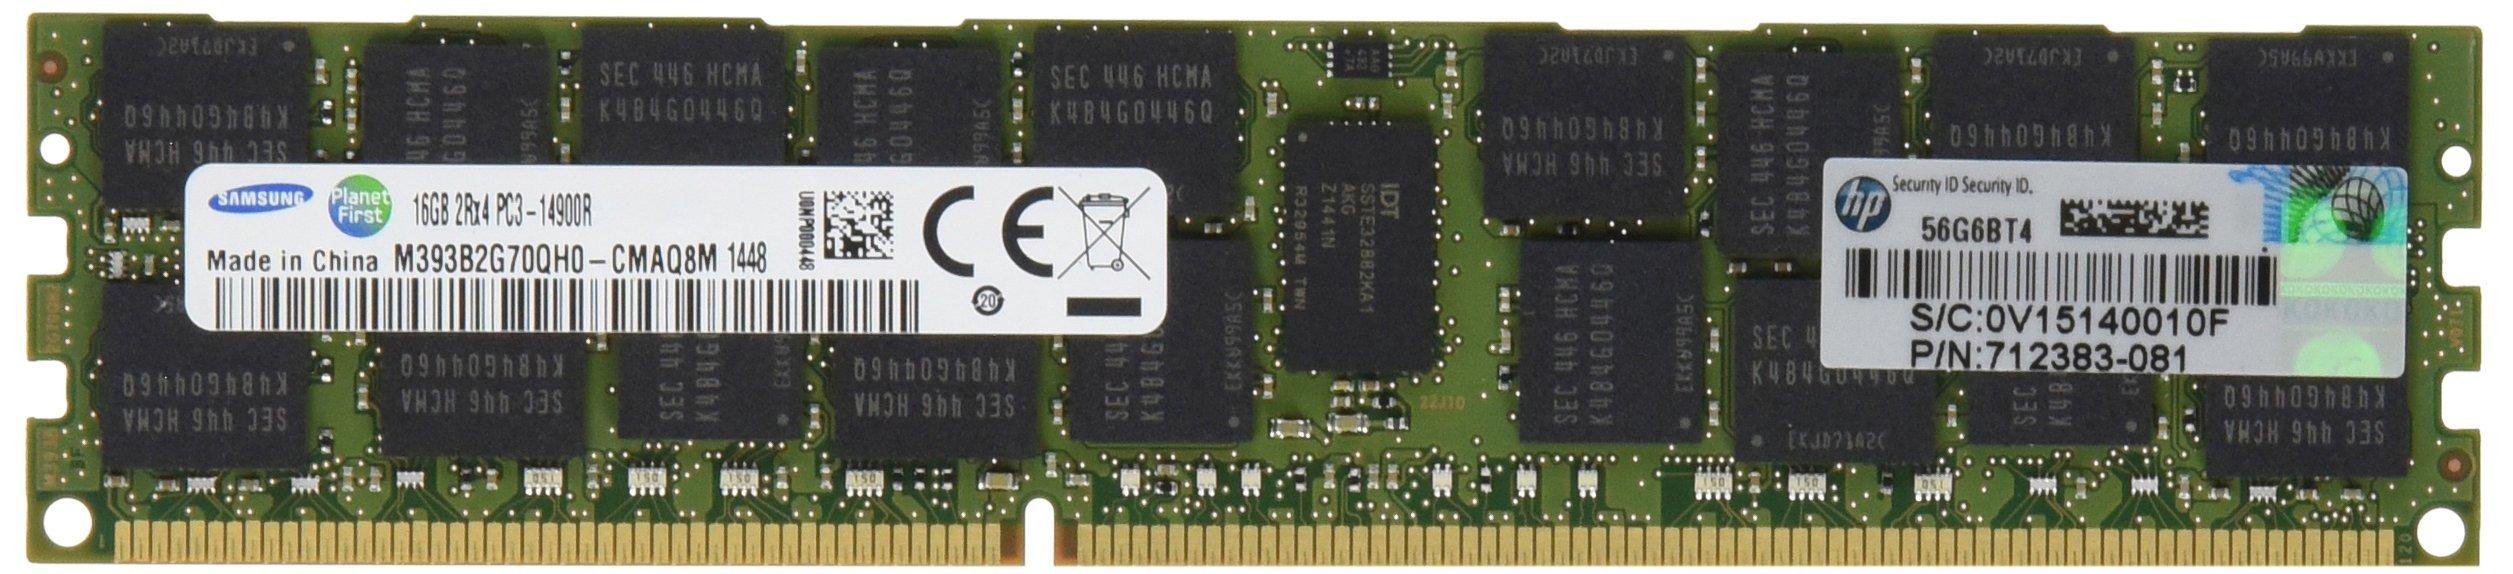 SAMSUNG 16GB 2RX4 PC3-14900R-13 MEMORY KIT Server Memory 715274-001 (Renewed)